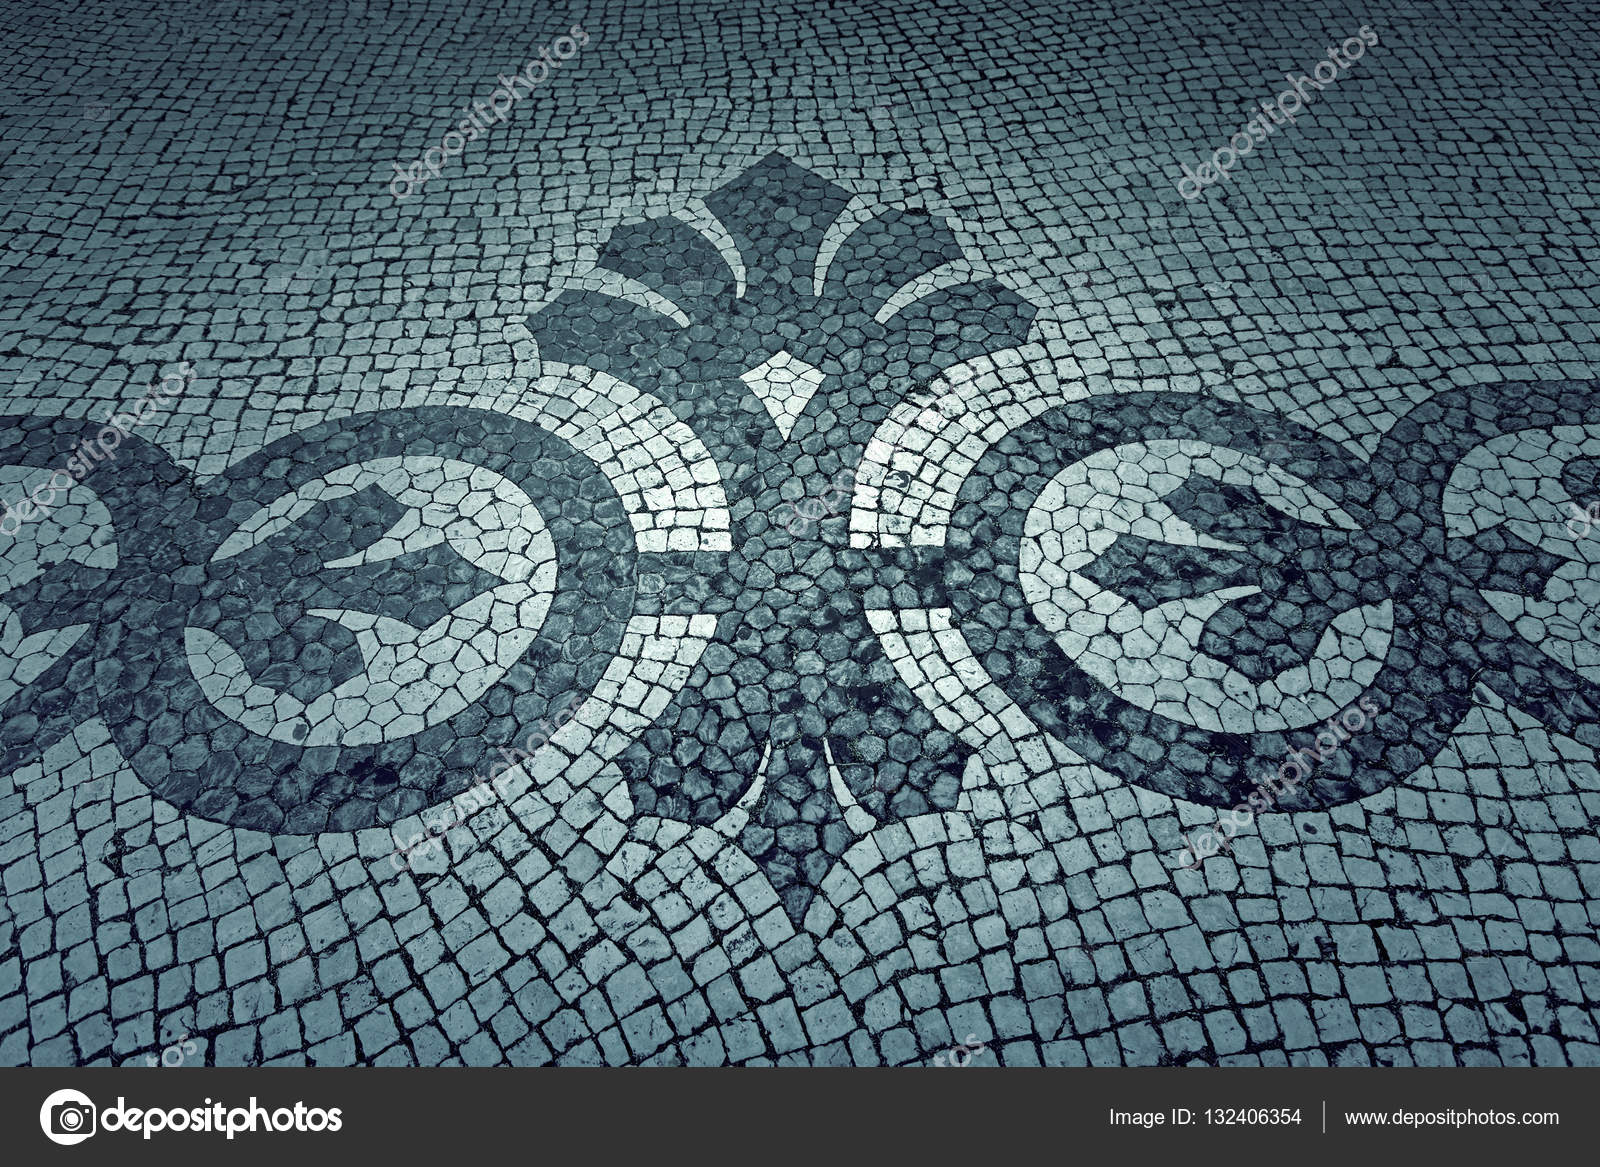 Bemalte Fliesen Stockfoto Celiafoto - Bemalte fliesen kaufen